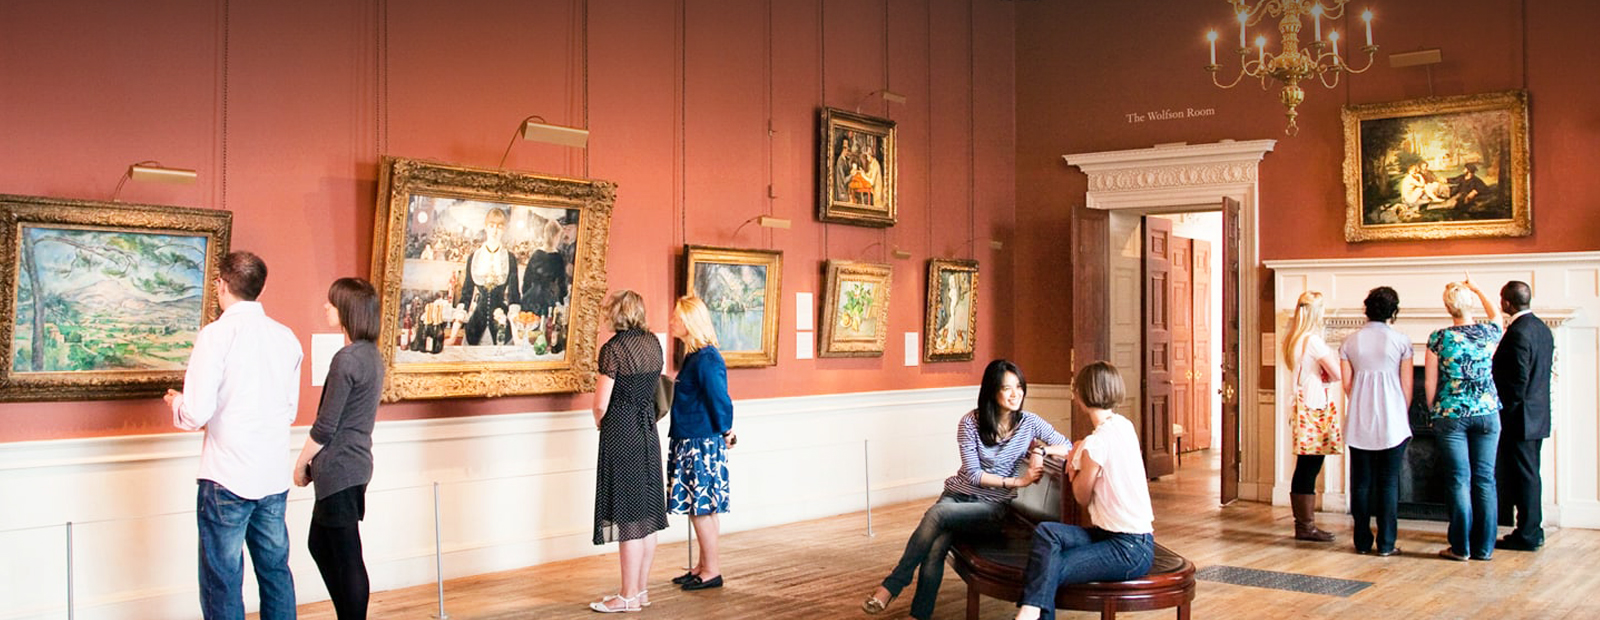 Destination Experiences London - Courtauld Gallery